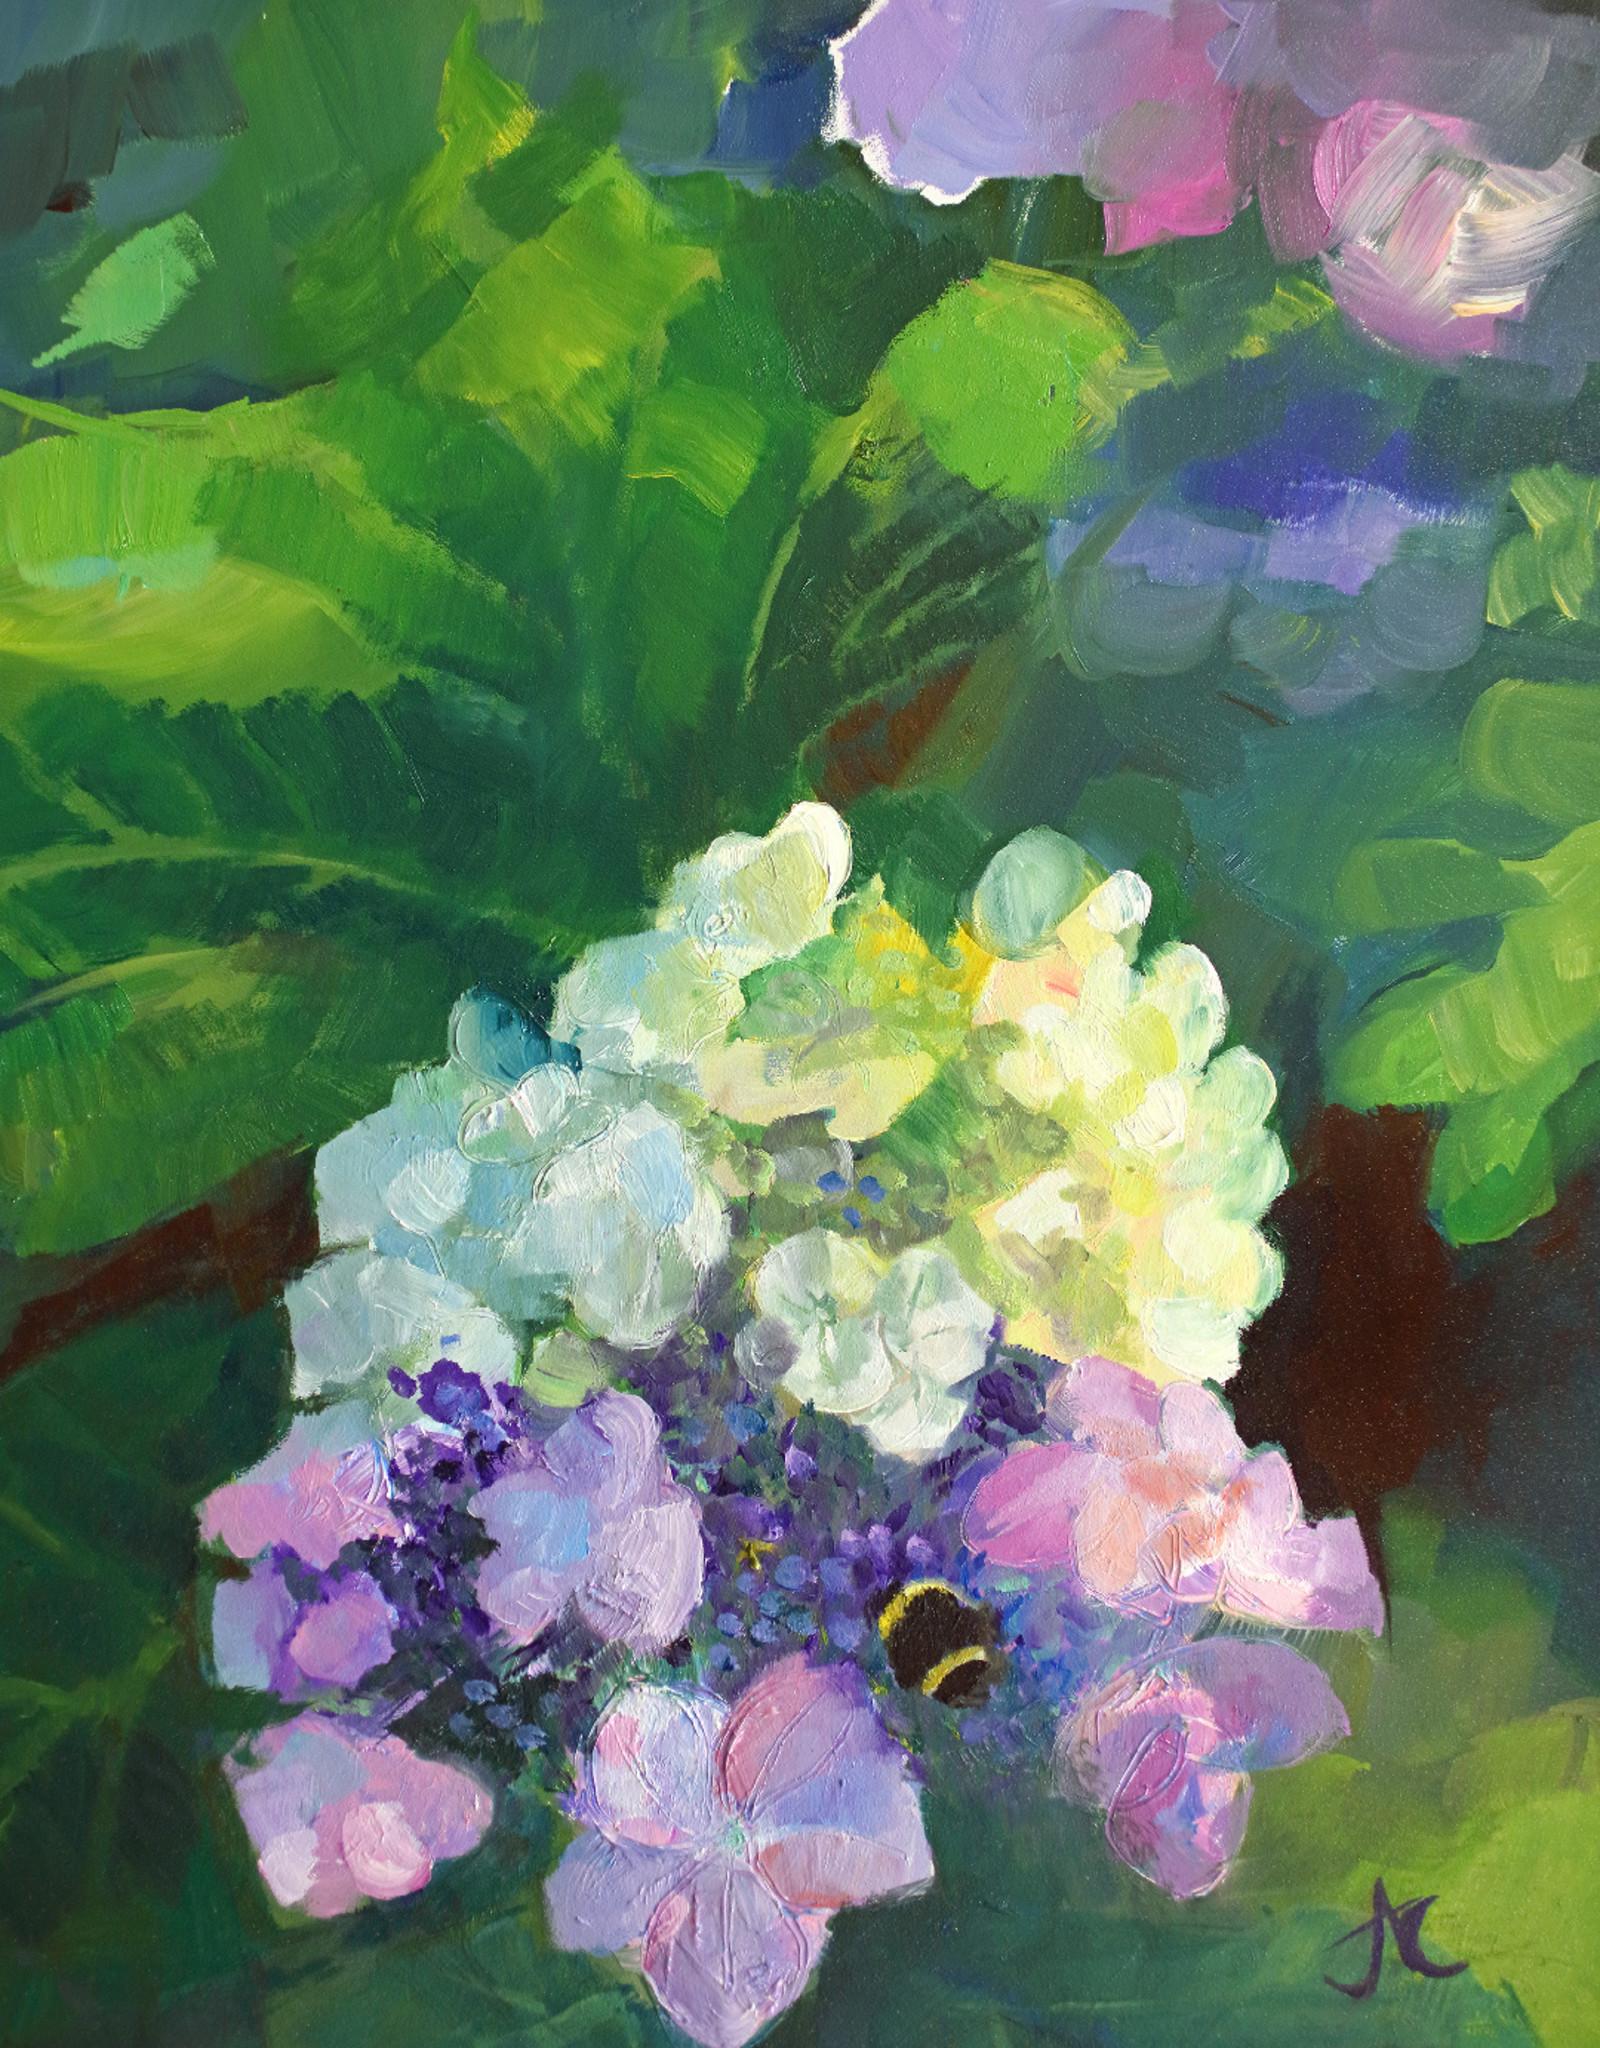 Jennifer Cook-Chrysos Chrysos Designs Artworks, Lacecap 1, oil on panel, 11 x 14